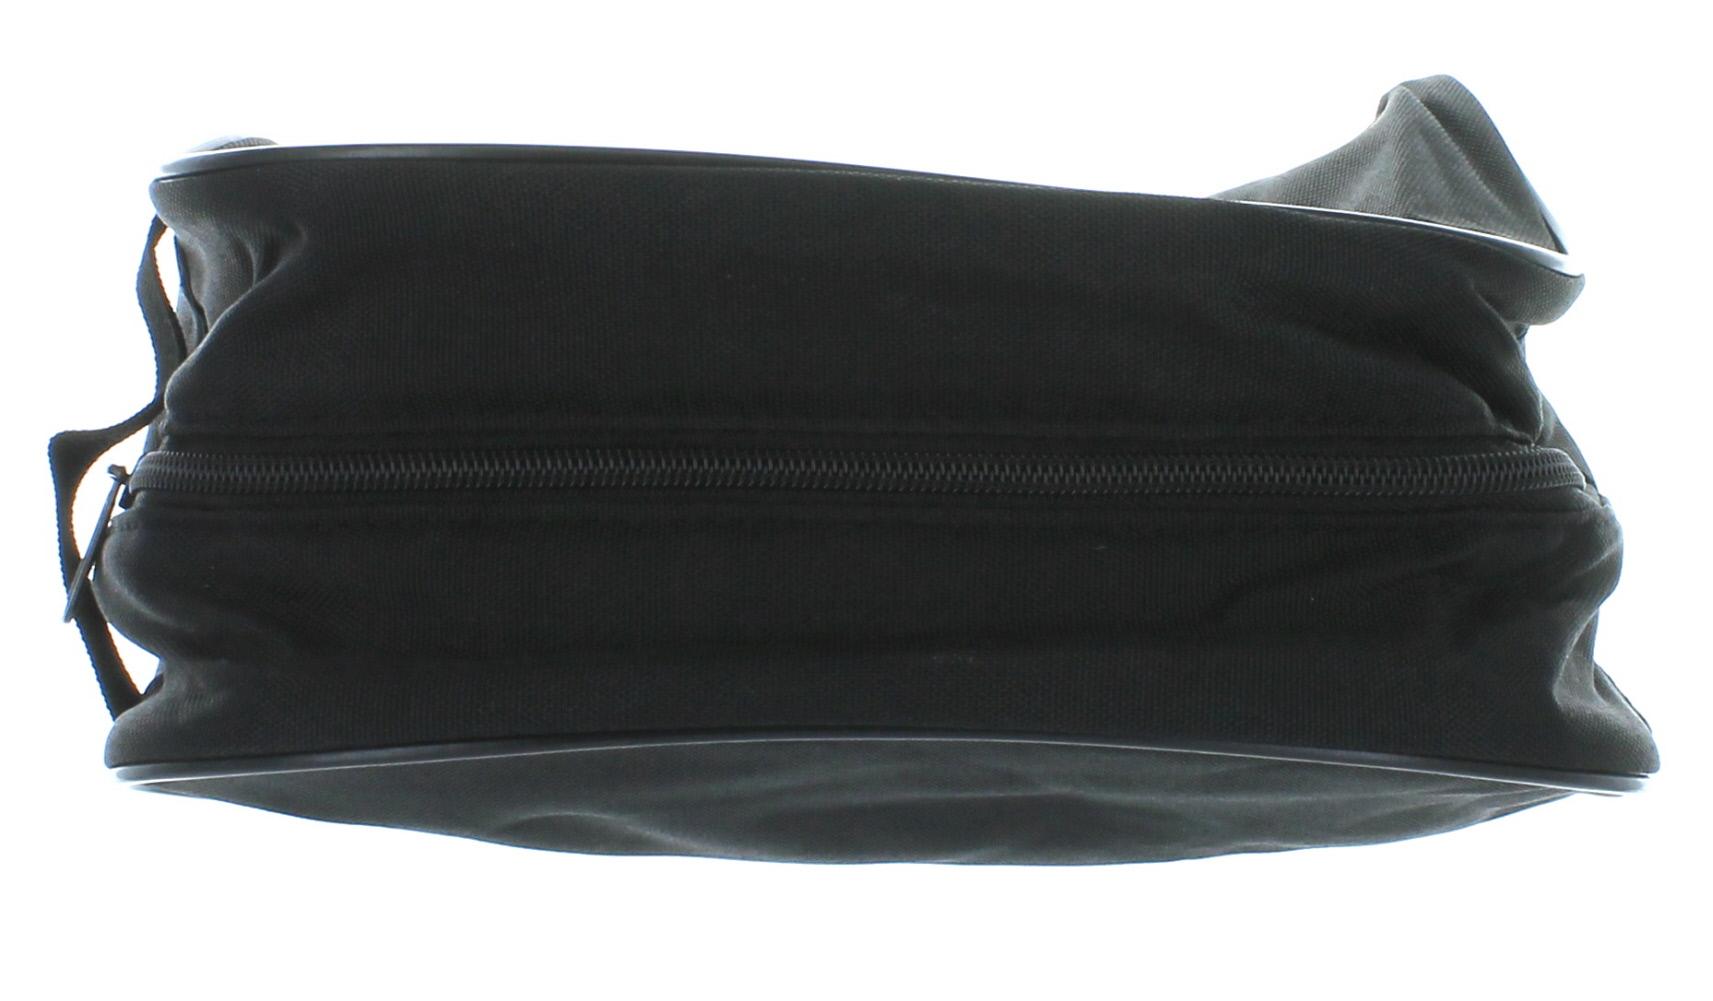 538db8a906b3 Black Gillette Men s Travel Bag Toiletry Shave Case Bag Dopp Kit - Walmart. com